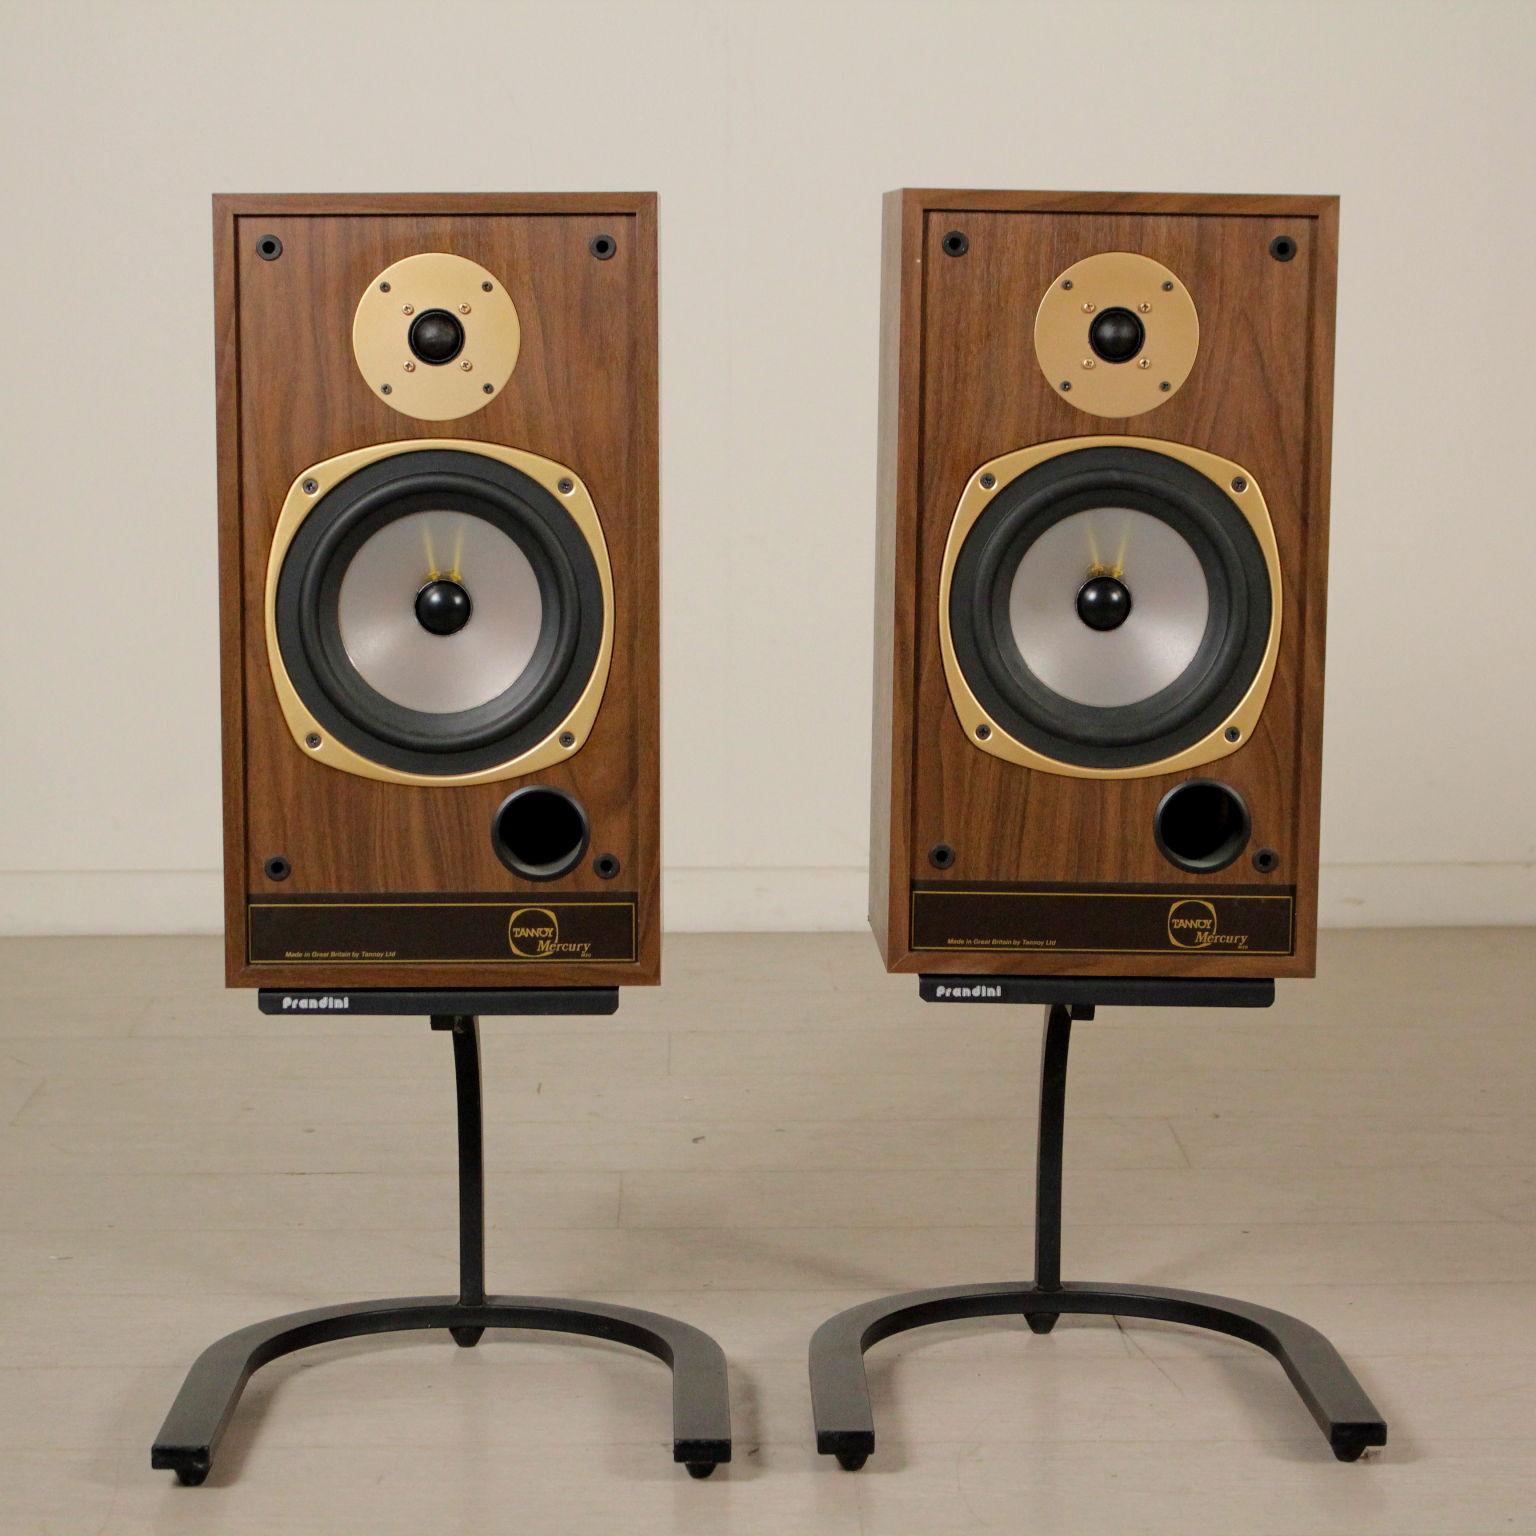 Tannoy speakers electronics modern design - Casse acustiche design ...